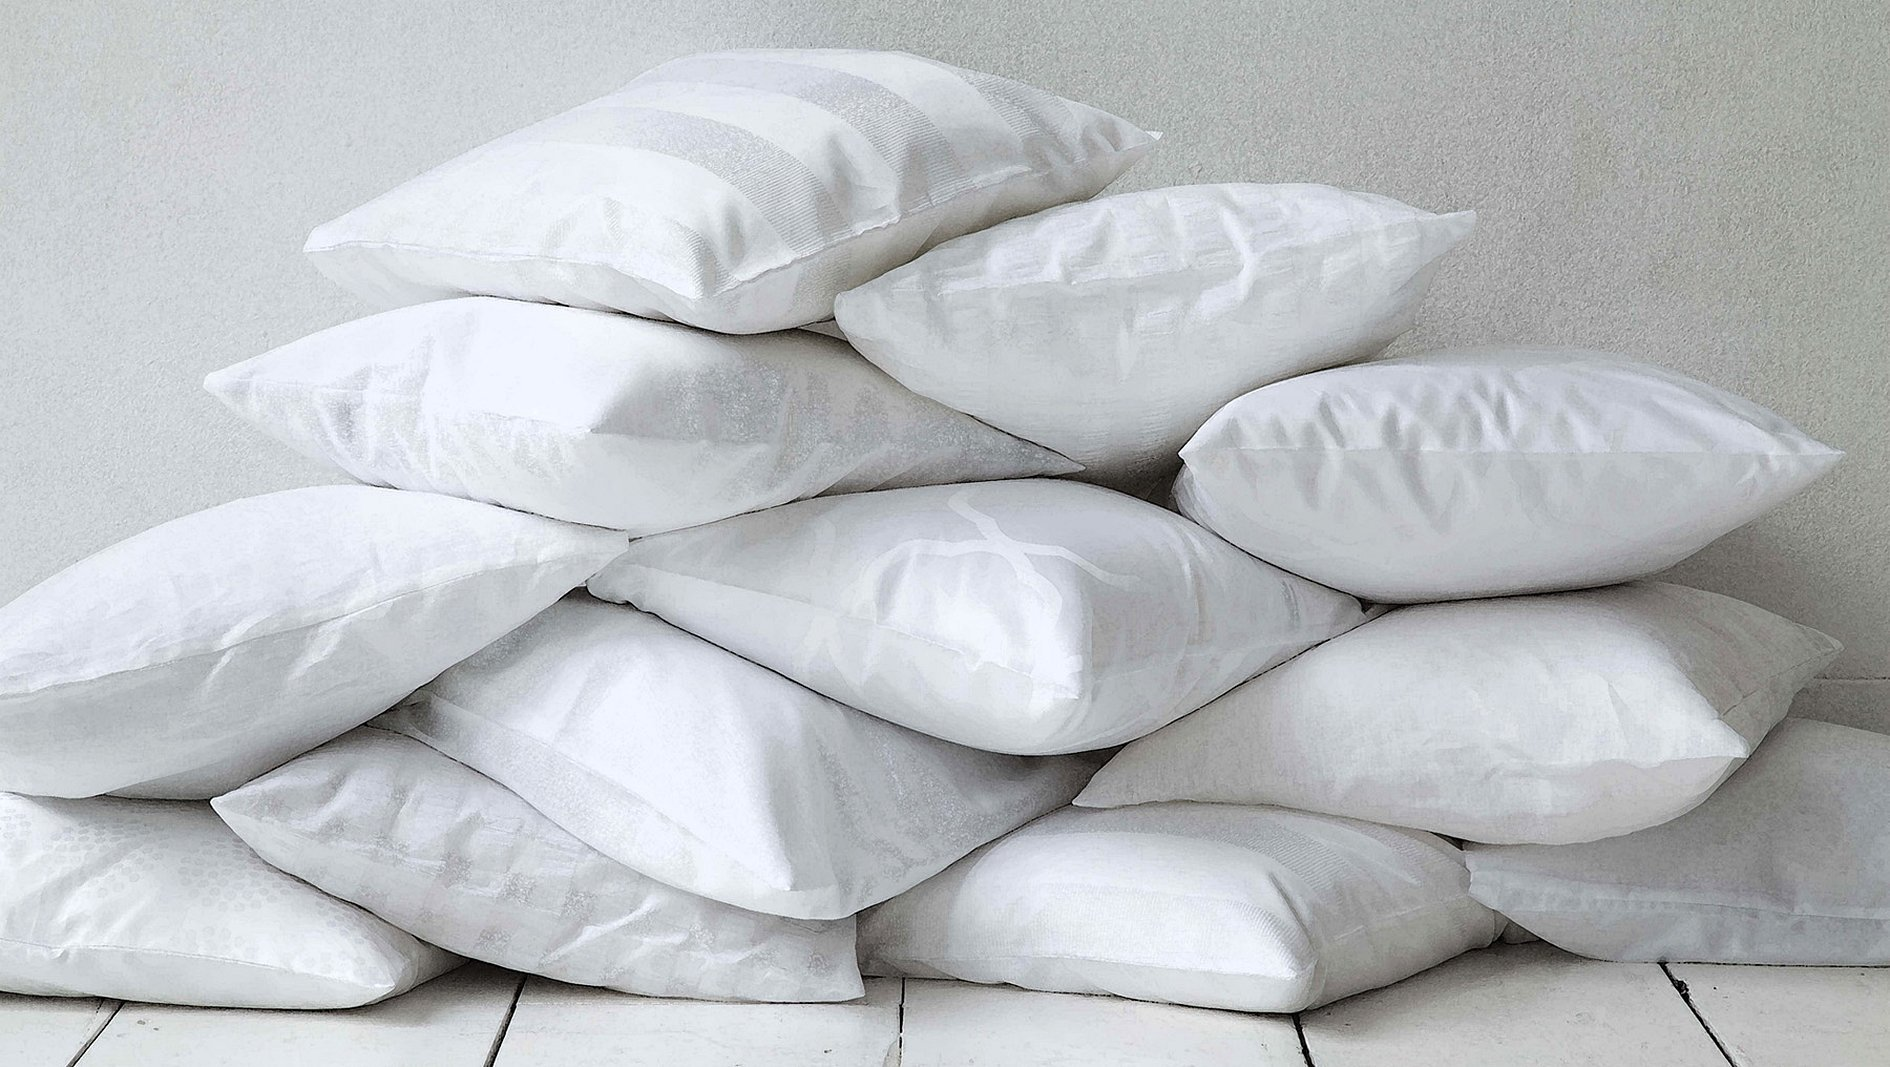 Перьевая подушка на белом фоне